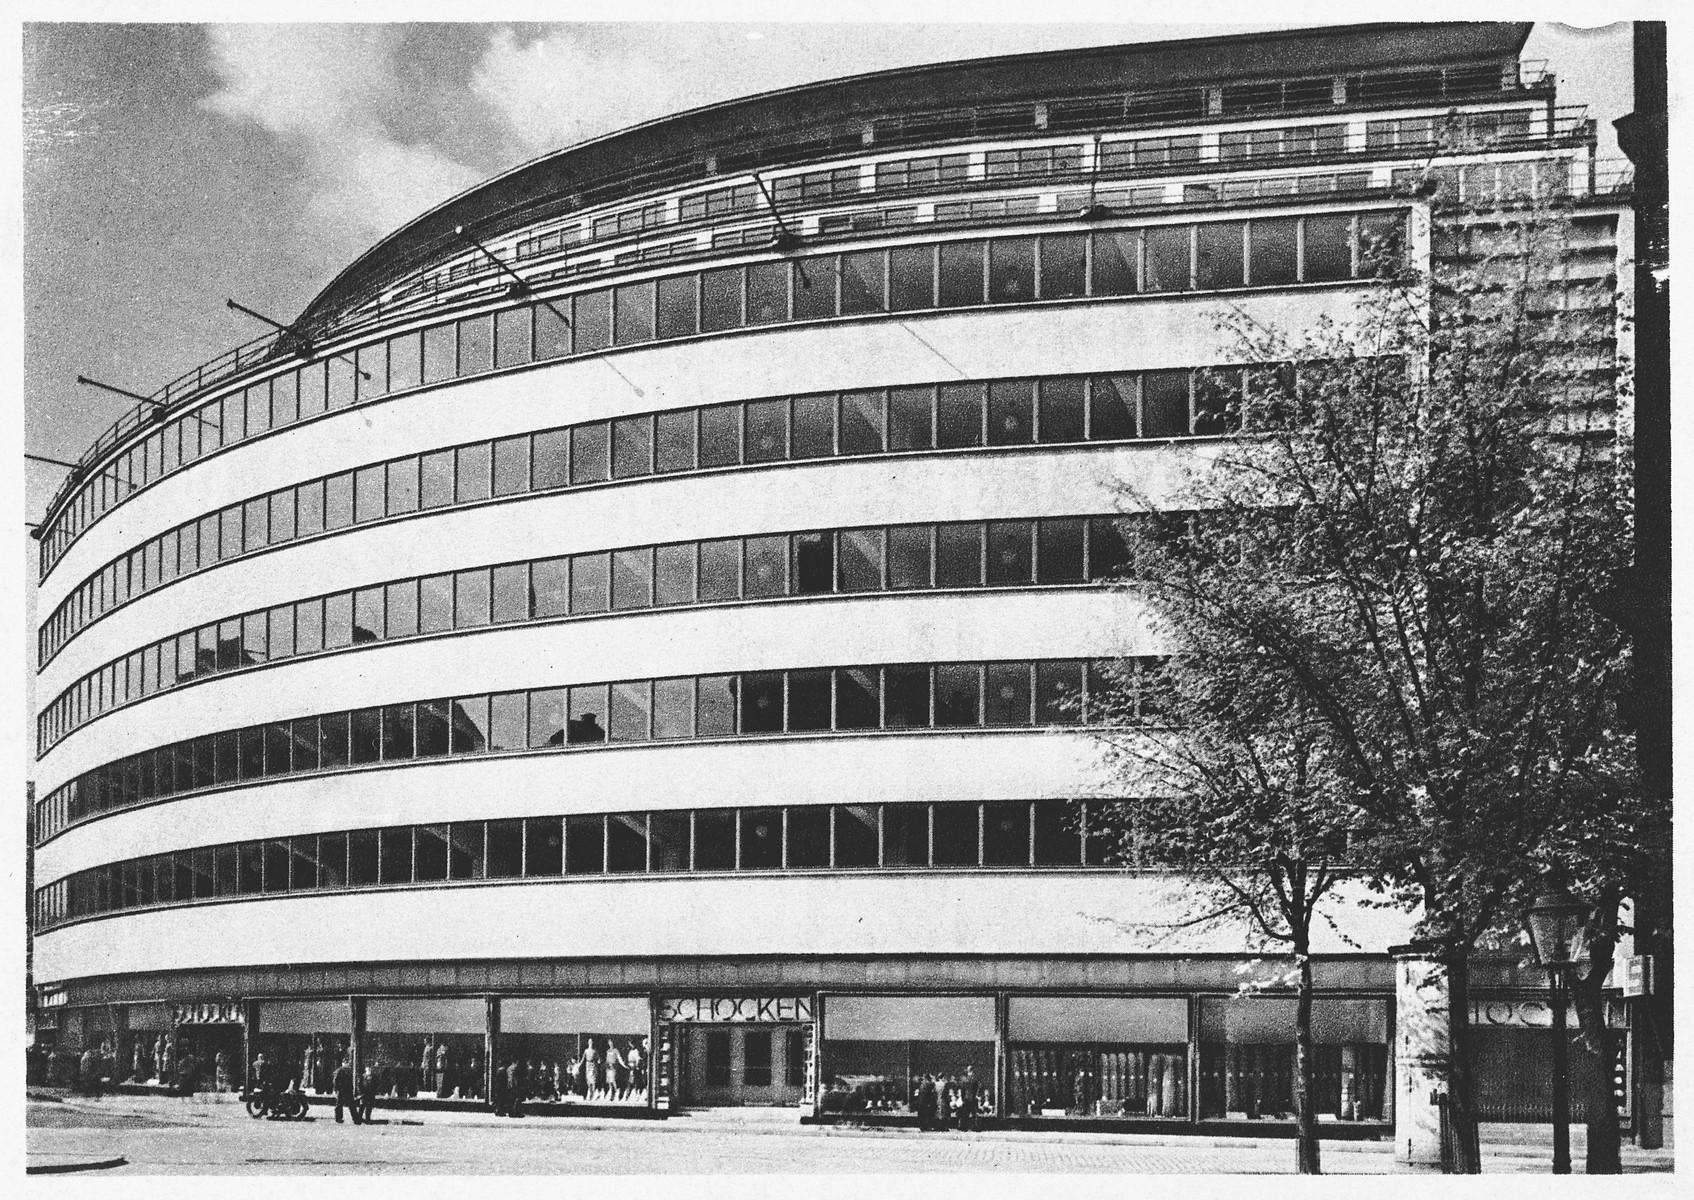 Exterior view of the Schocken department store in Chemnitz, Germany.